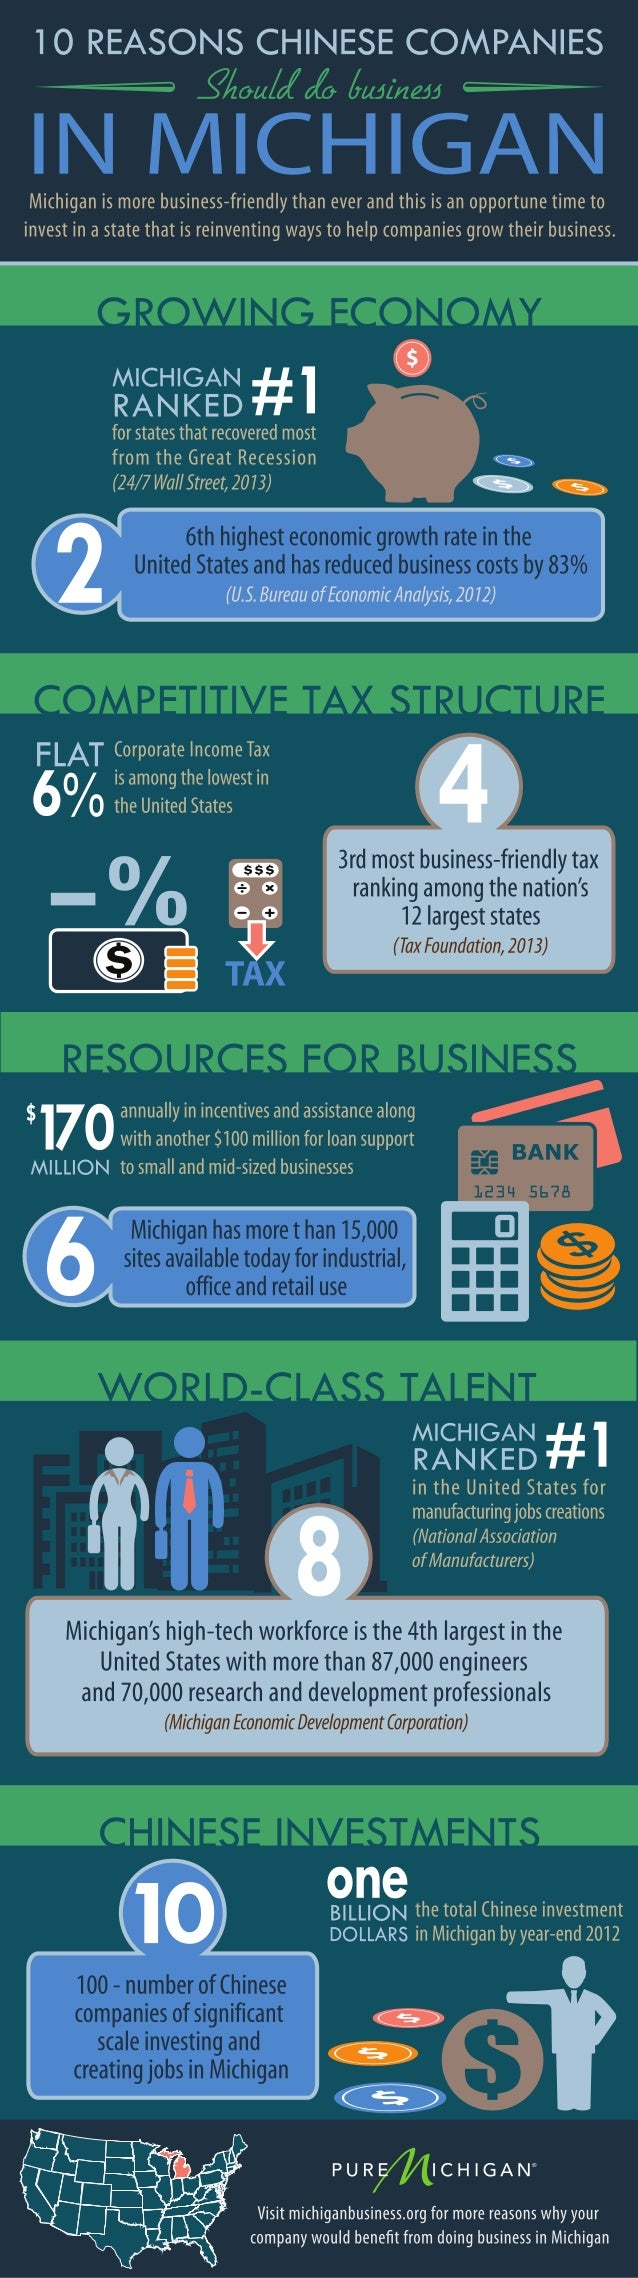 Ten Reasons Chinese Companies Should Do Business In Michigan